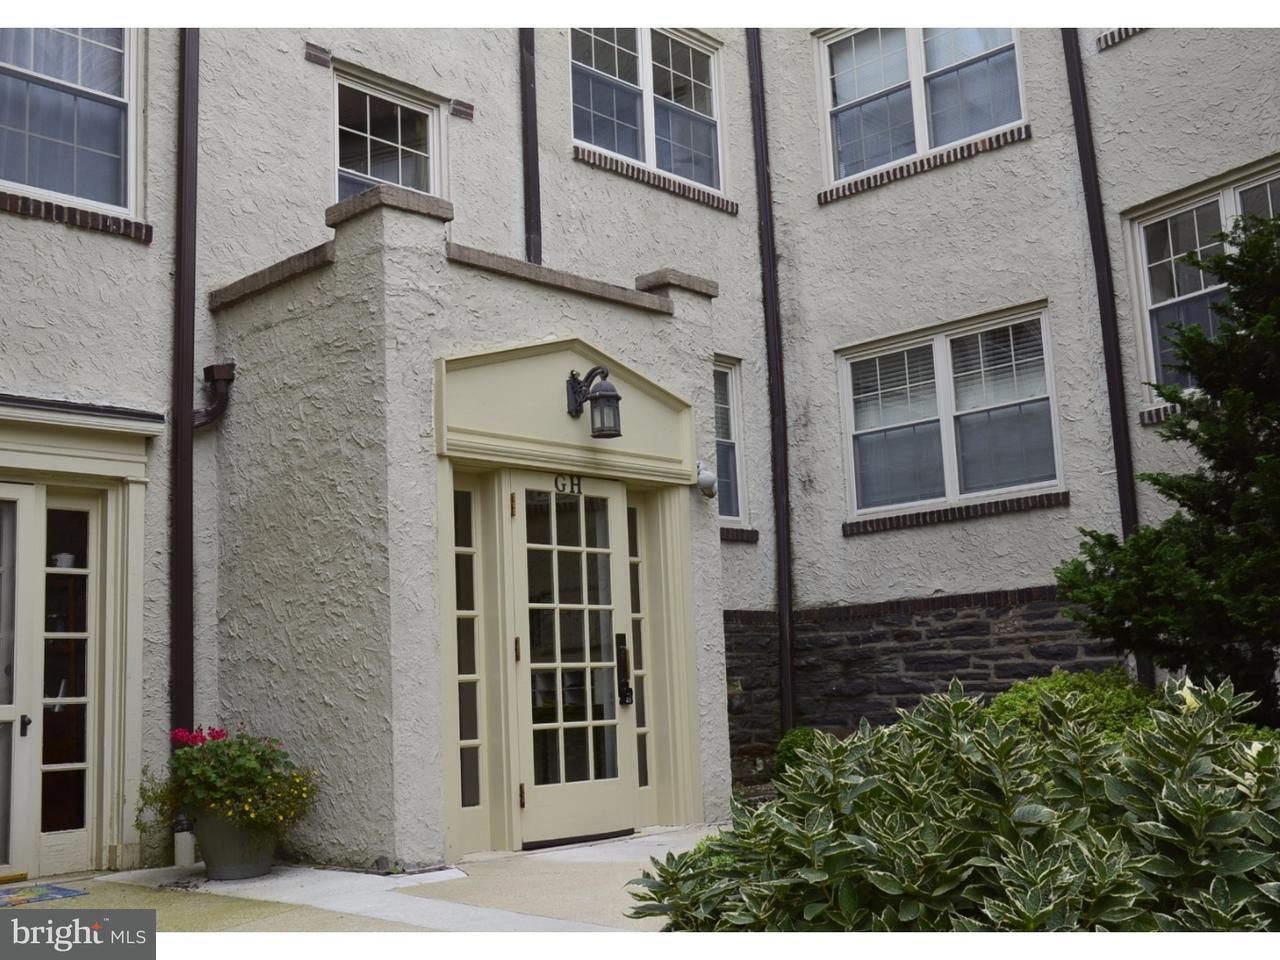 Condominium for Sale at 212 IDRIS RD #G3 Merion Station, Pennsylvania 19066 United States